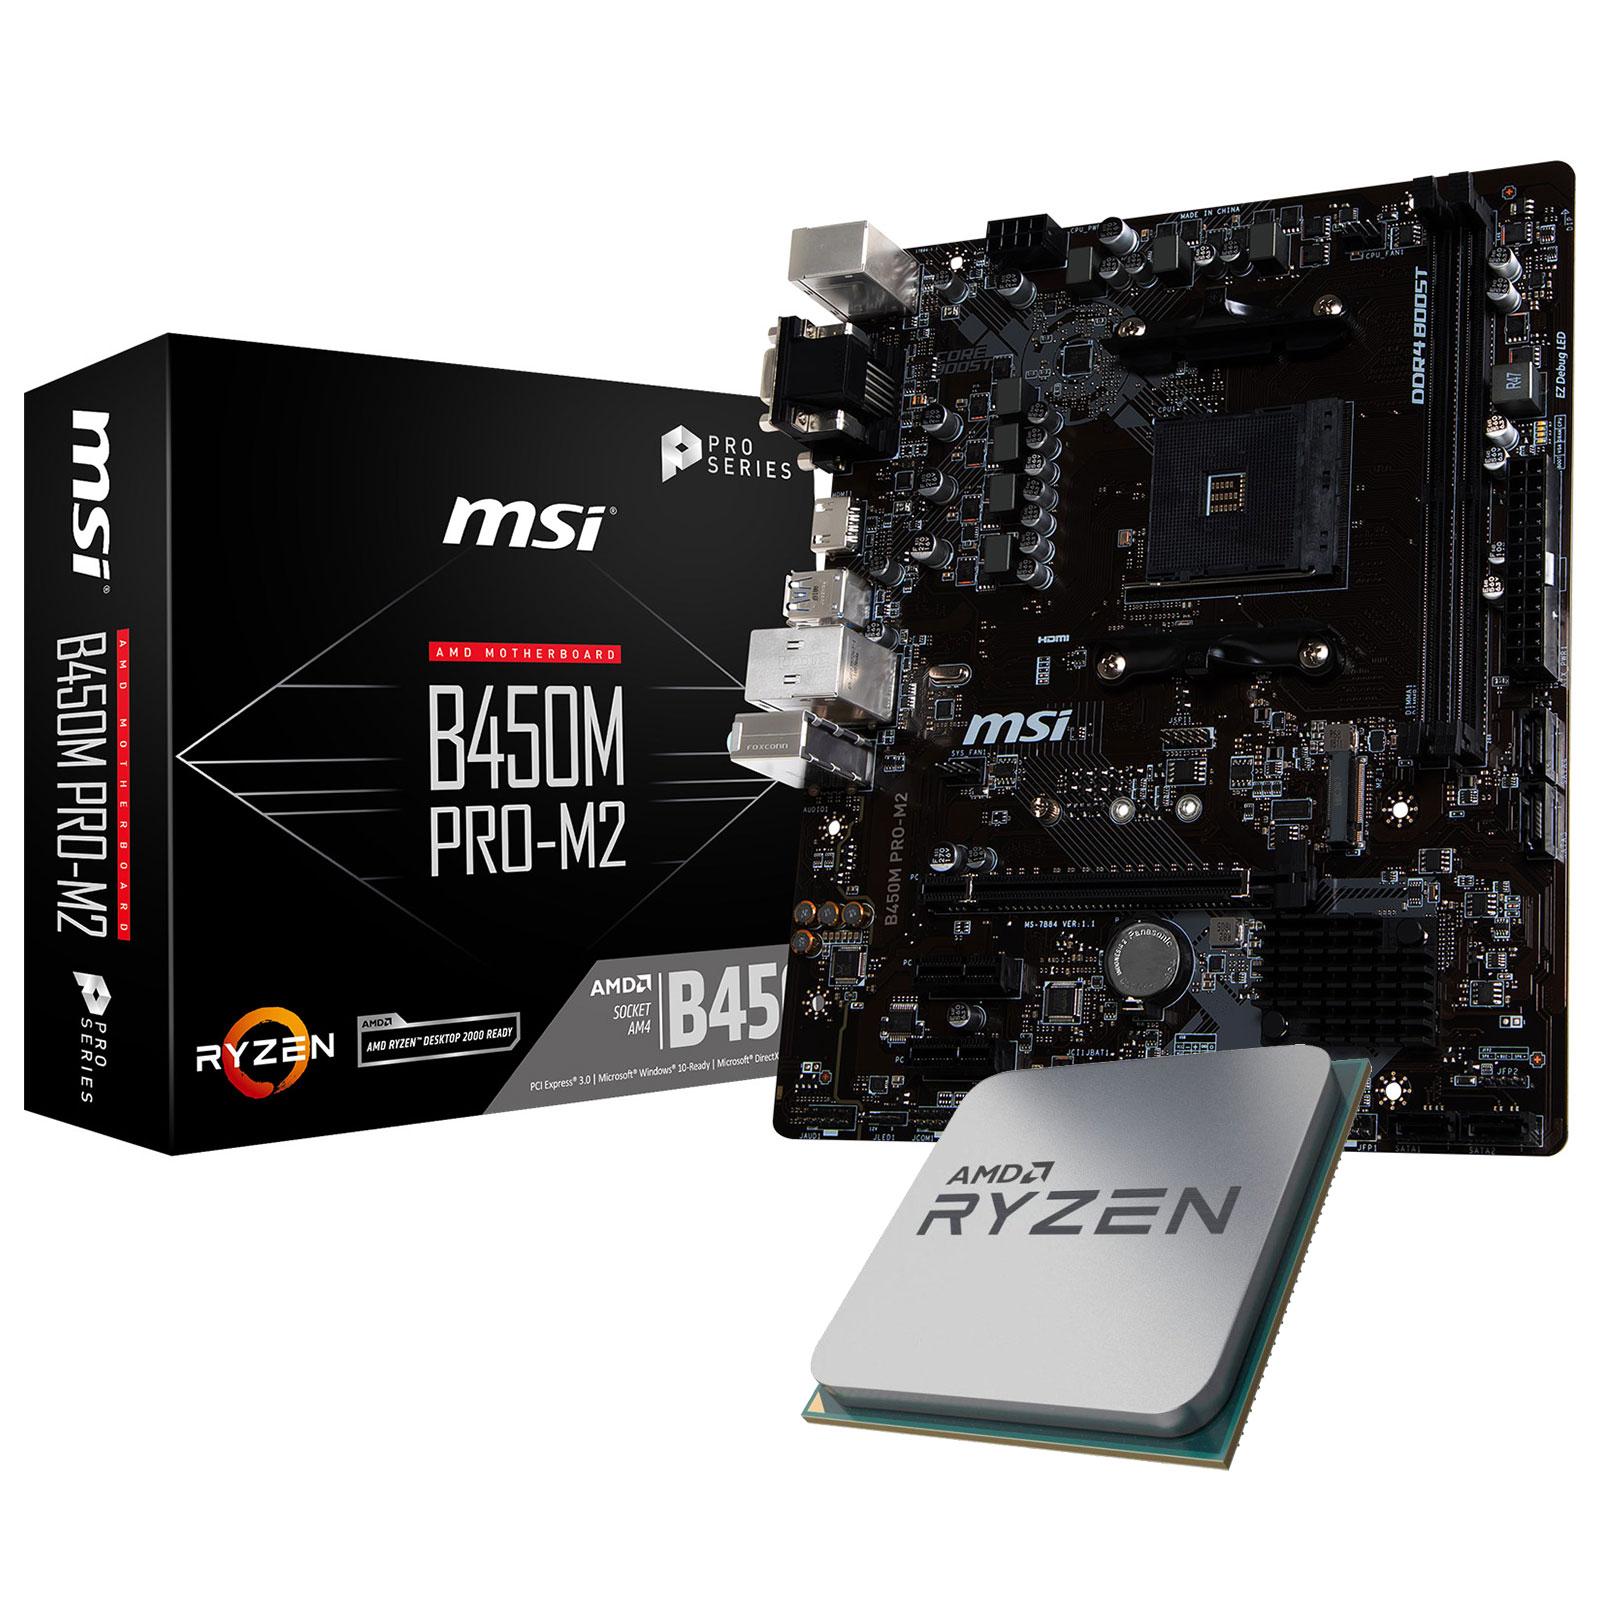 Kit upgrade PC Kit Upgrade PC AMD Ryzen 5 2600X MSI B450M PRO-M2 Carte mère Micro ATX Socket AM4 AMD B450 + CPU AMD Ryzen 5 2600X (3.6 GHz)